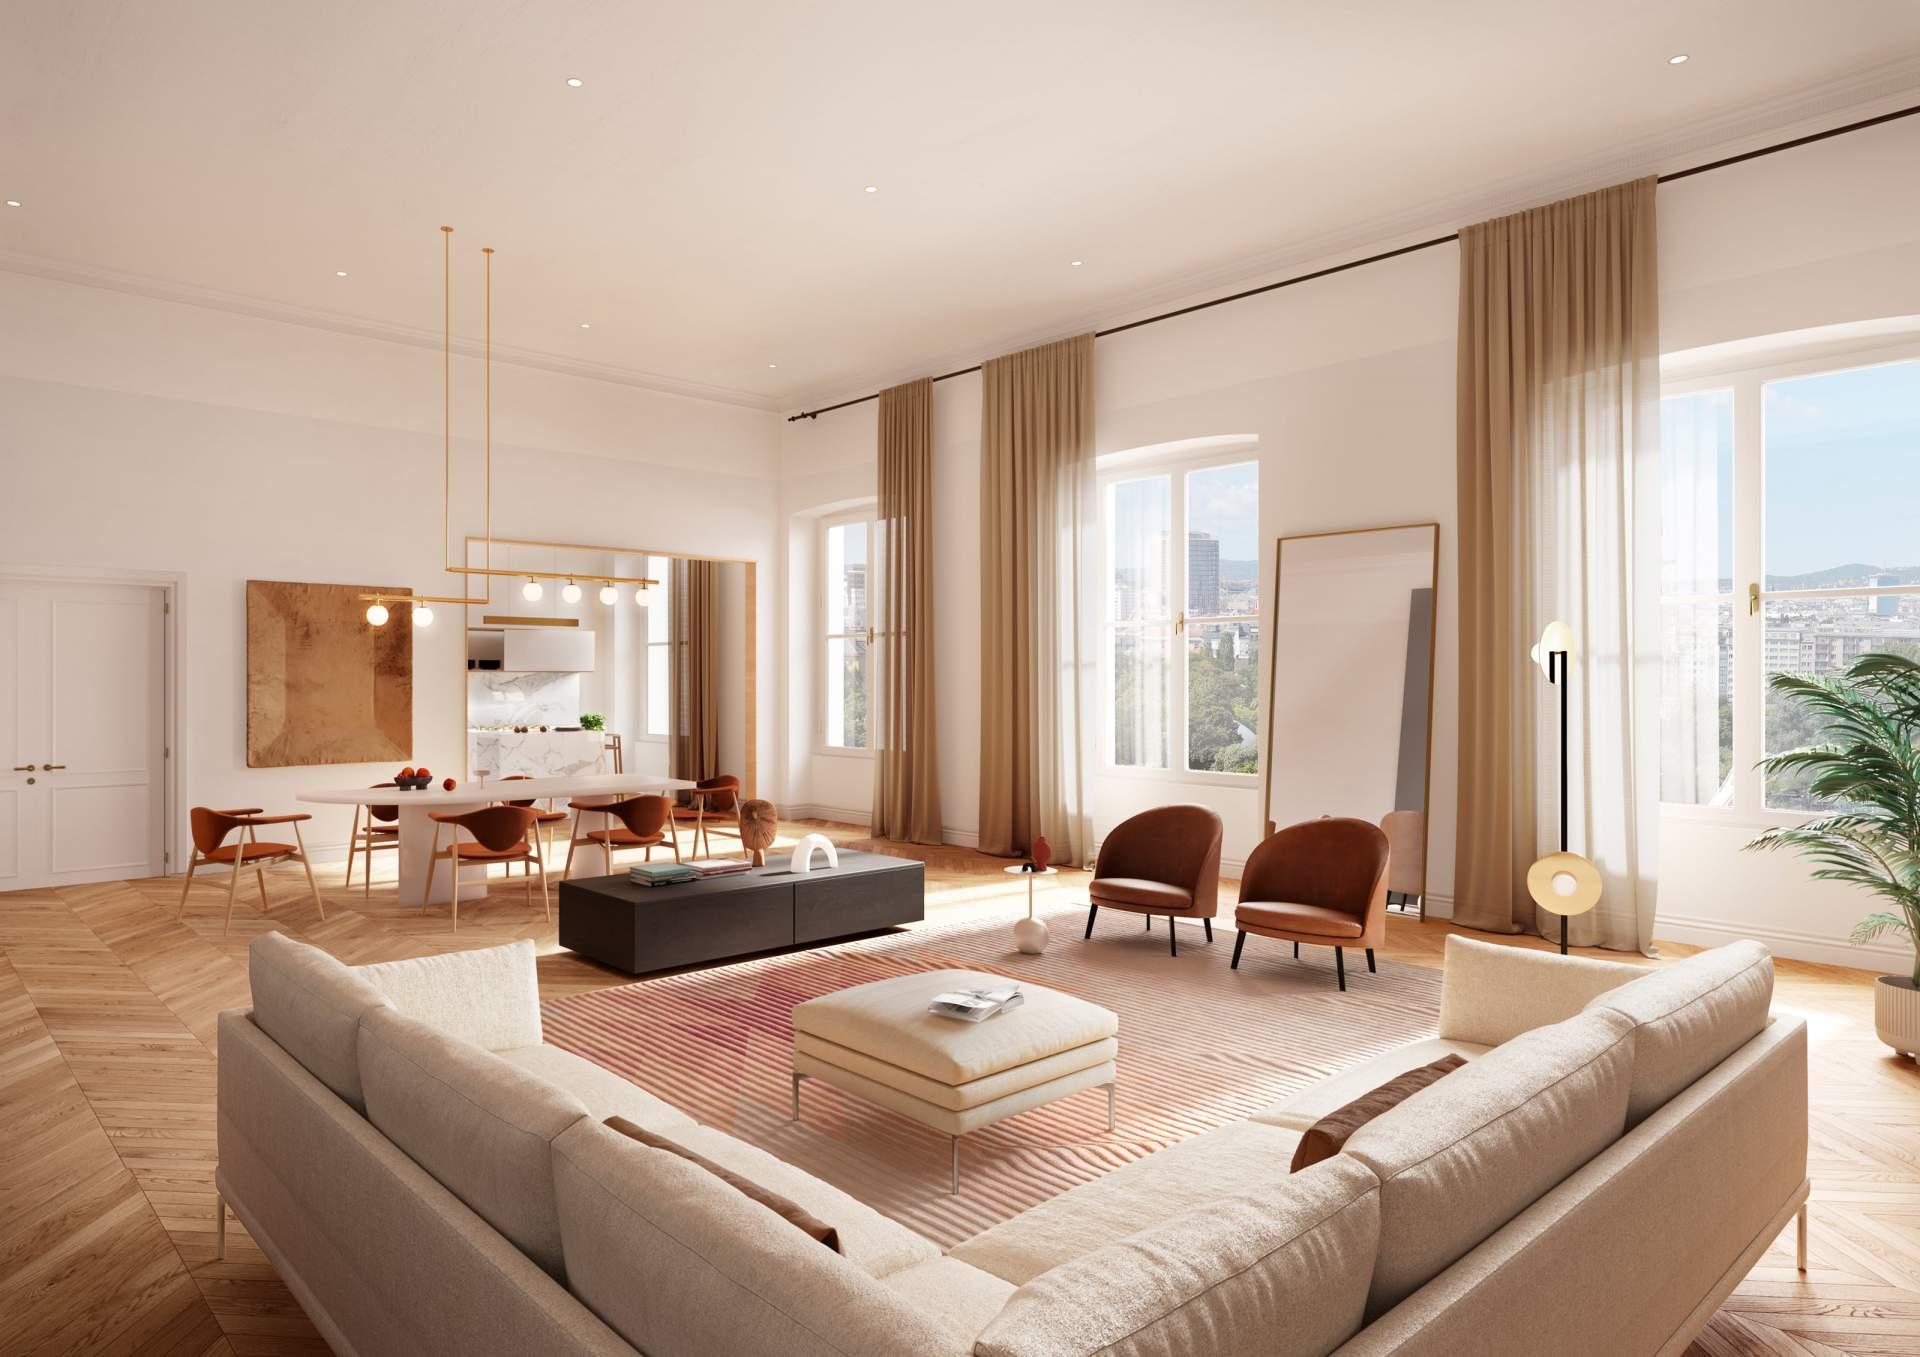 Apartment 401 - Living room